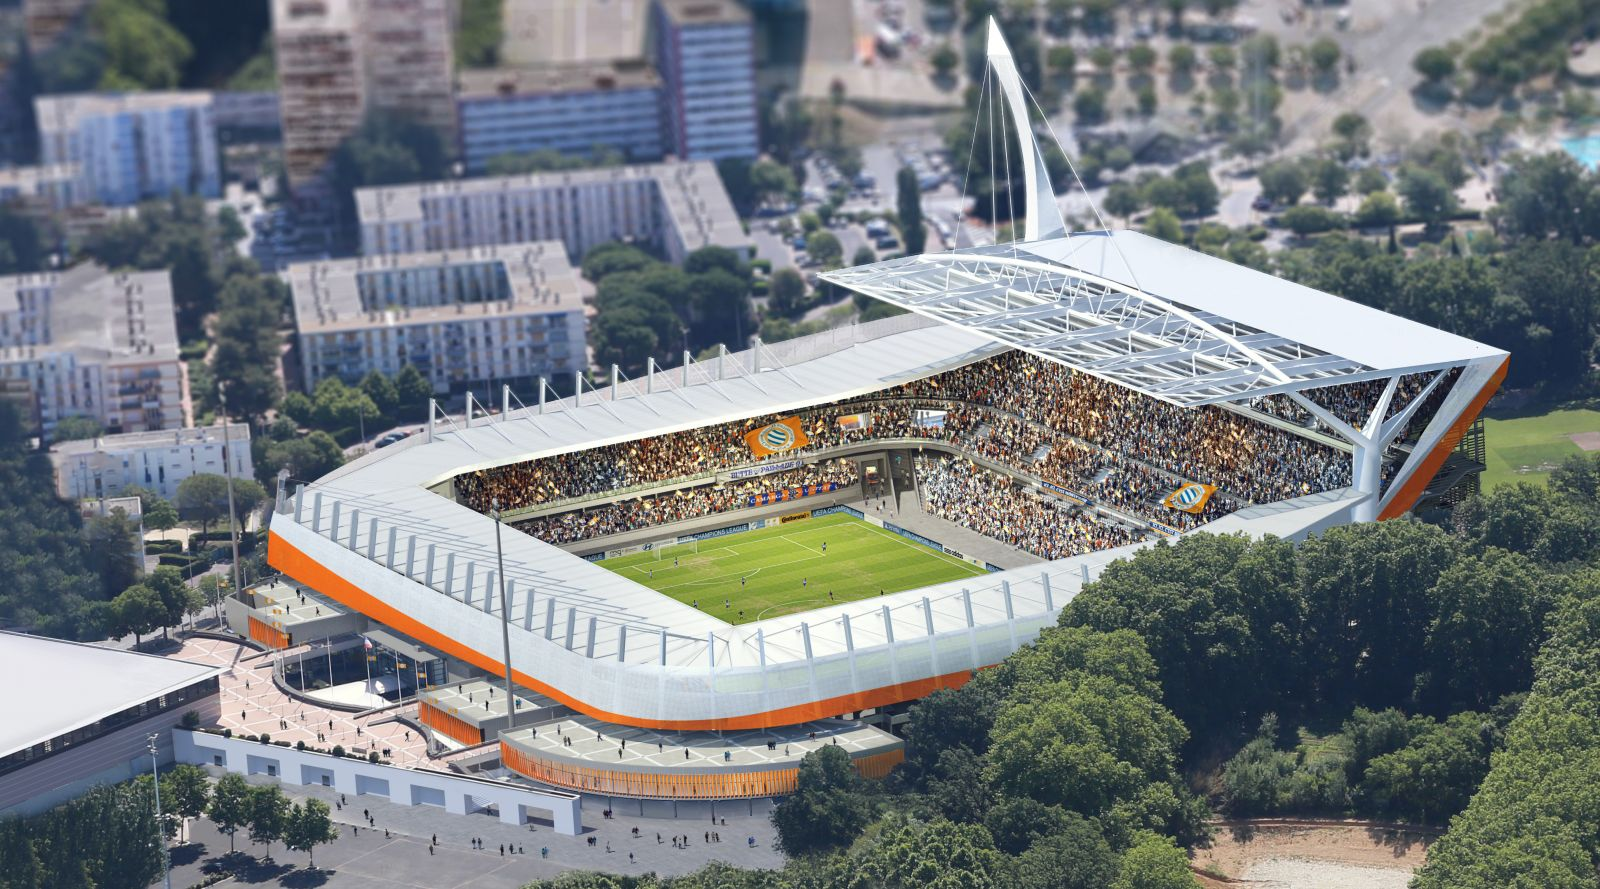 http://www.info-stades.fr/uploads/stades/la-mosson-toiture-79290.jpg